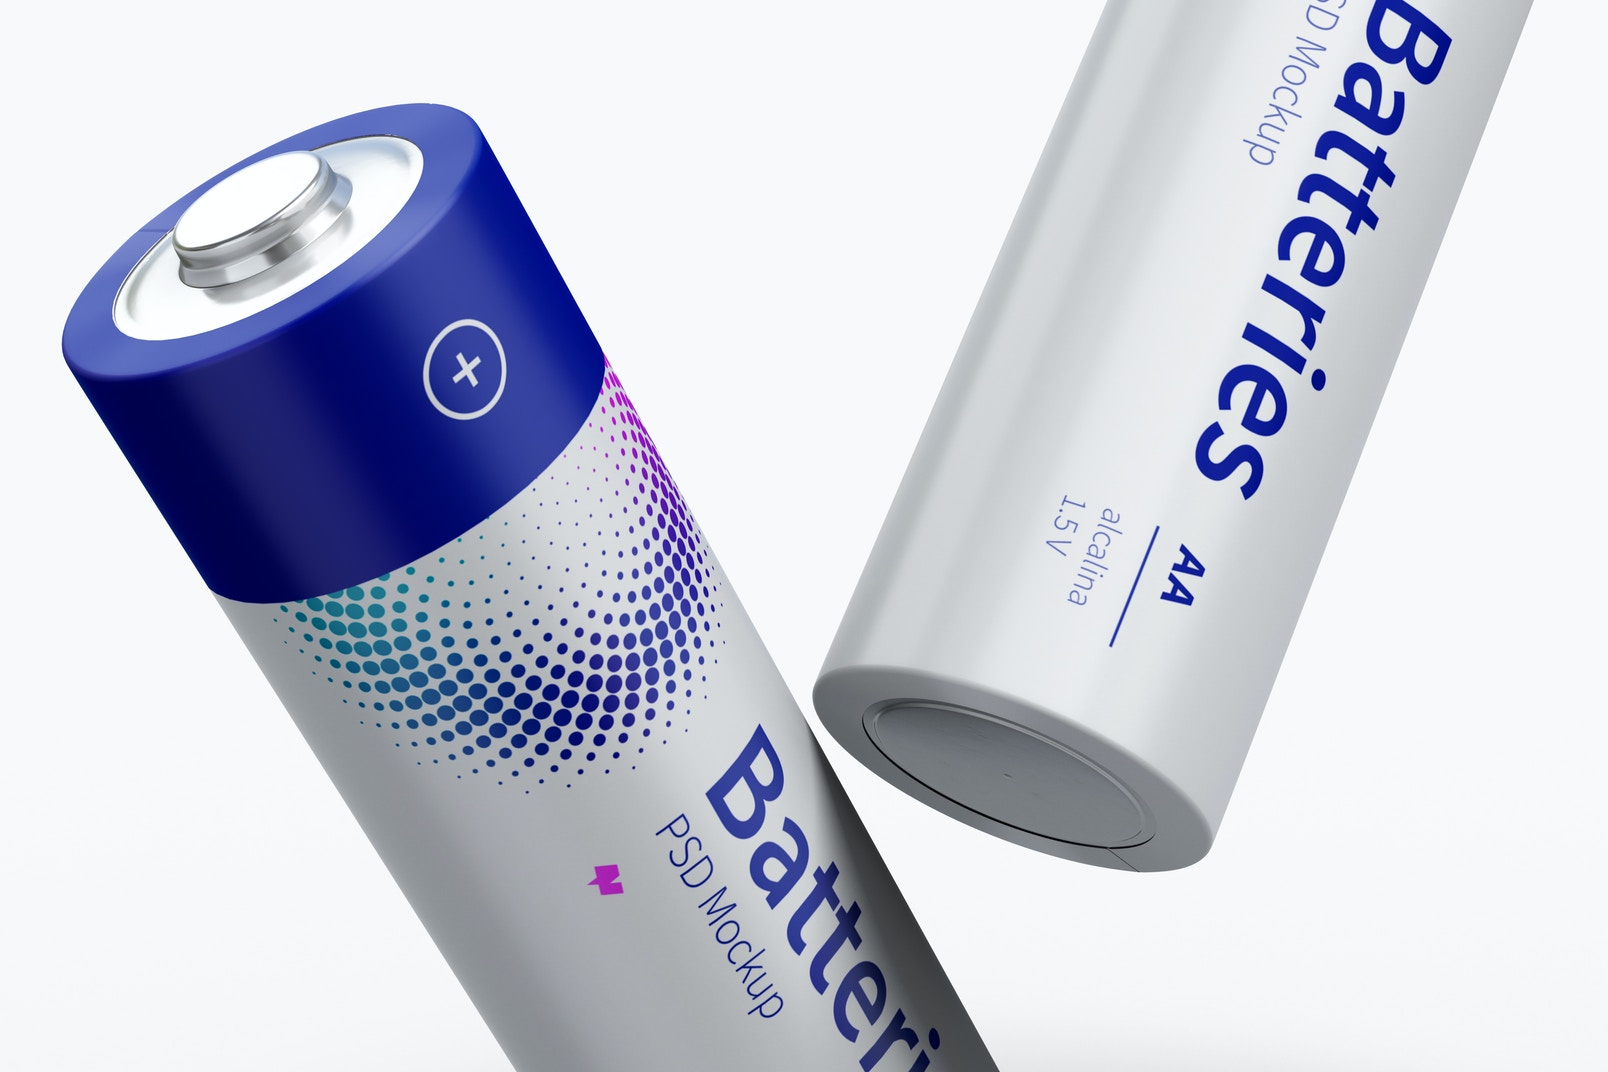 Two AA Batteries Mockup, Close-up